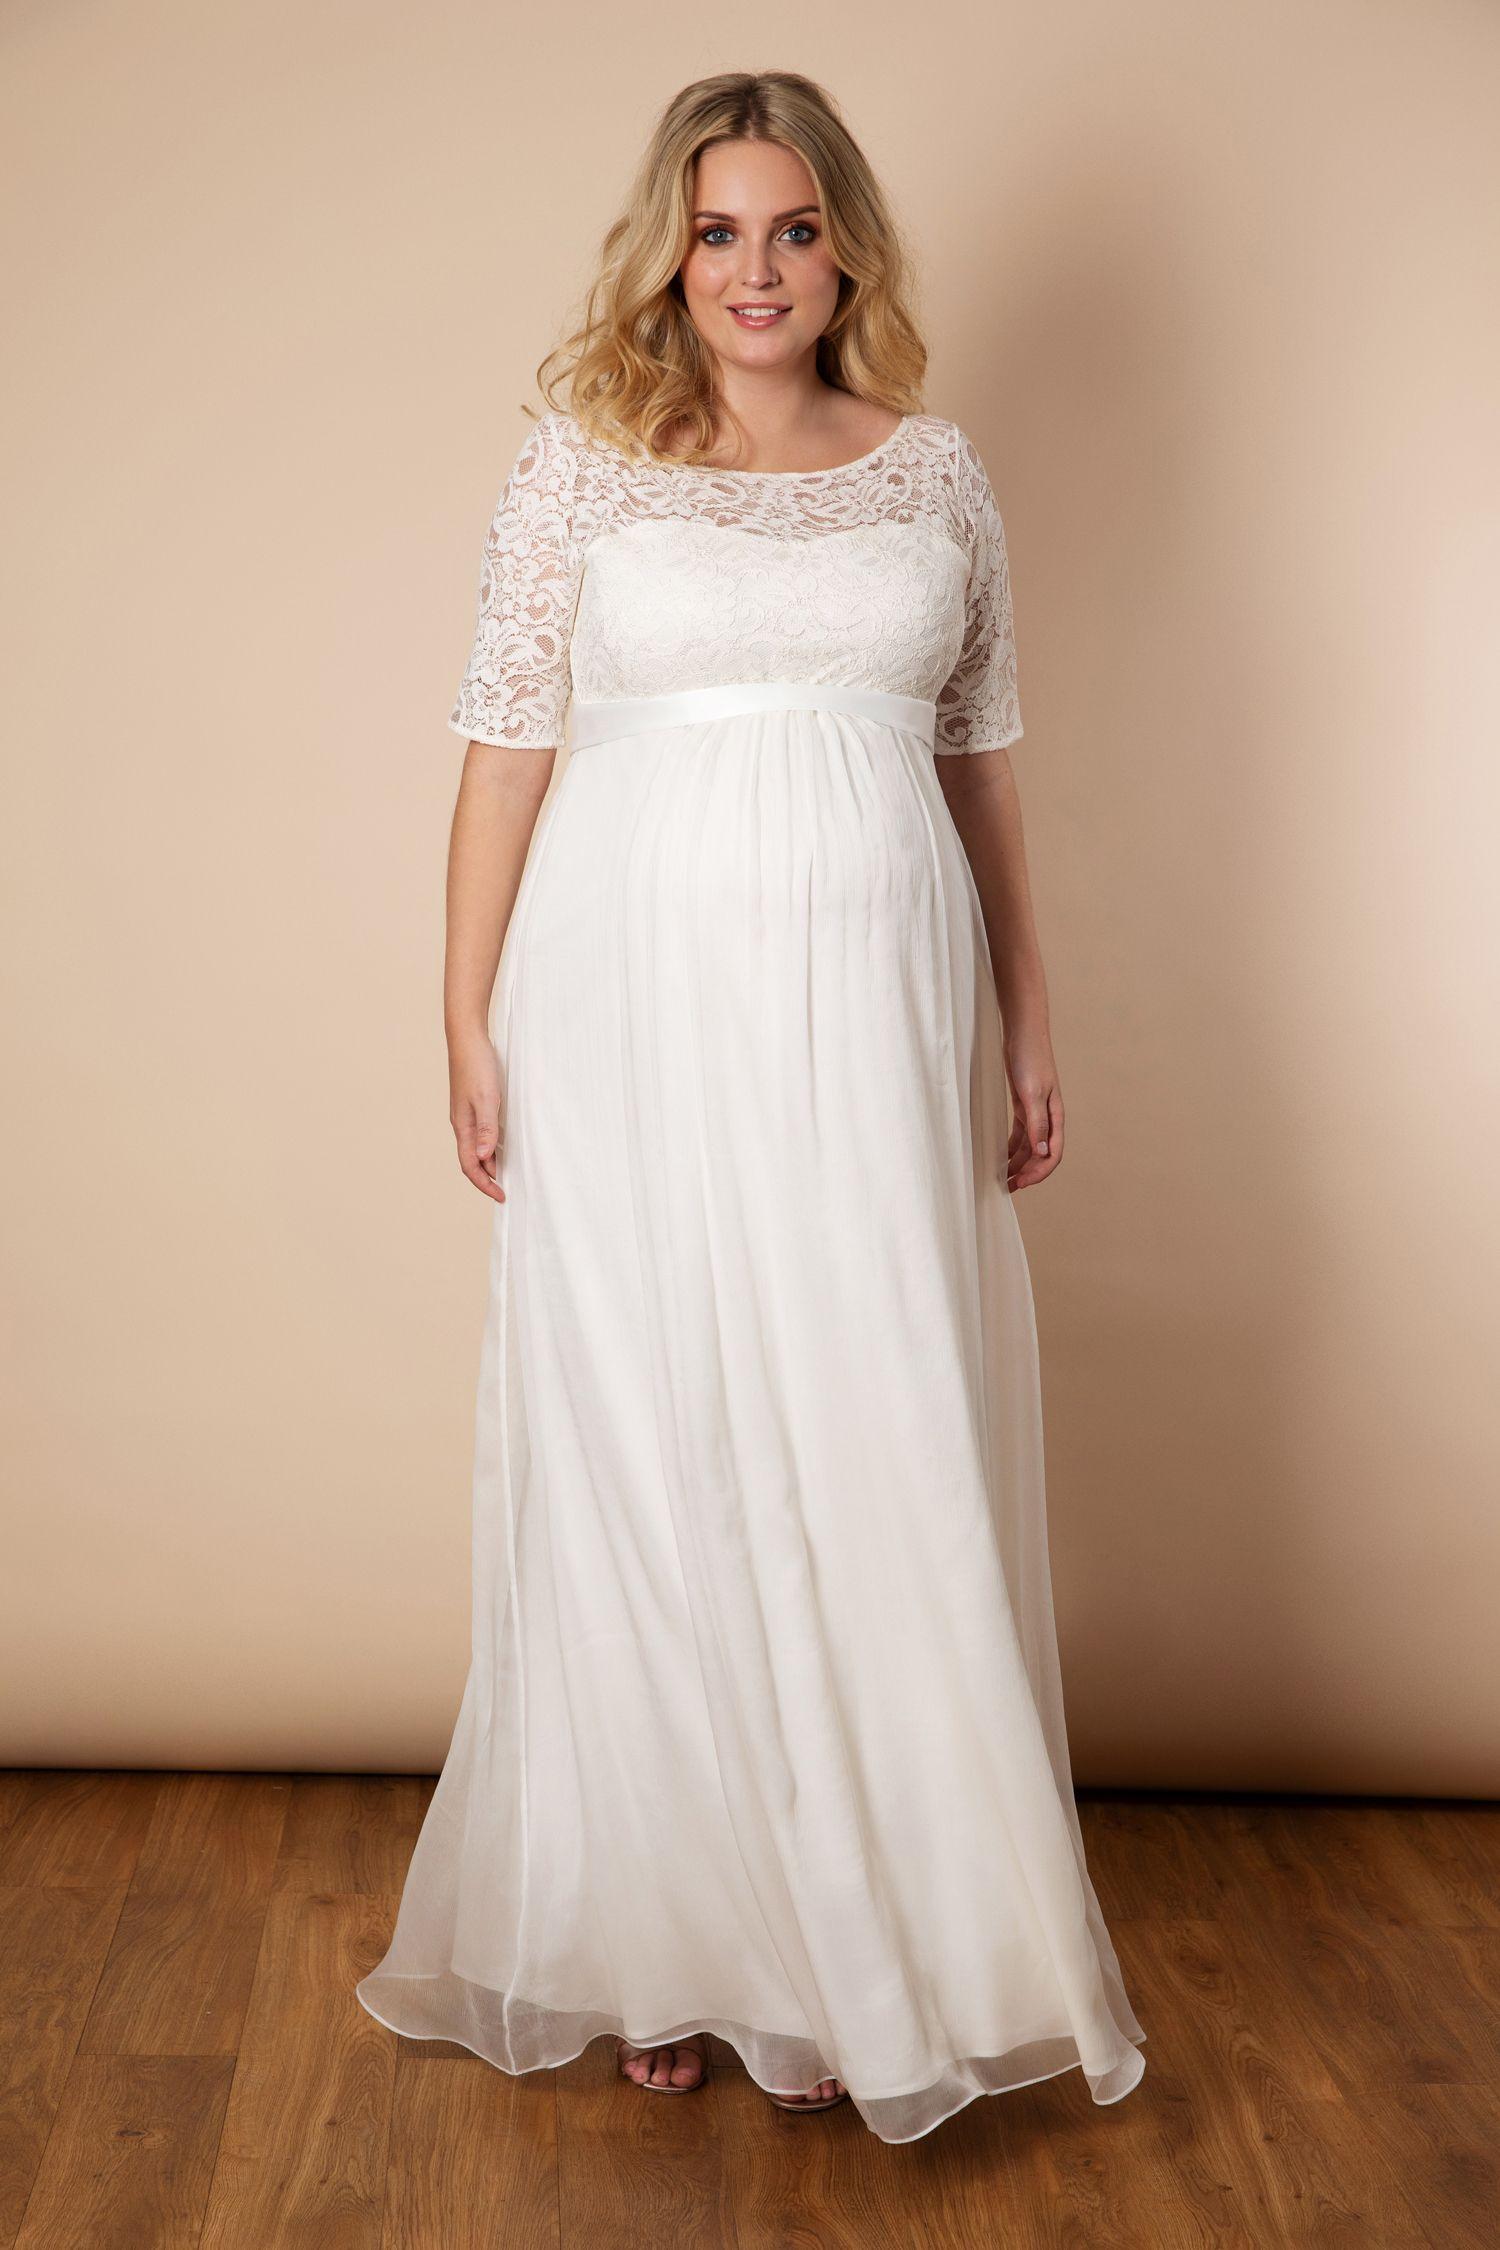 30 Long Sleeve Wedding Dresses Our Favourite Picks Chiffon Wedding Gowns Pregnant Wedding Dress Sheer Wedding Dress [ 2250 x 1500 Pixel ]